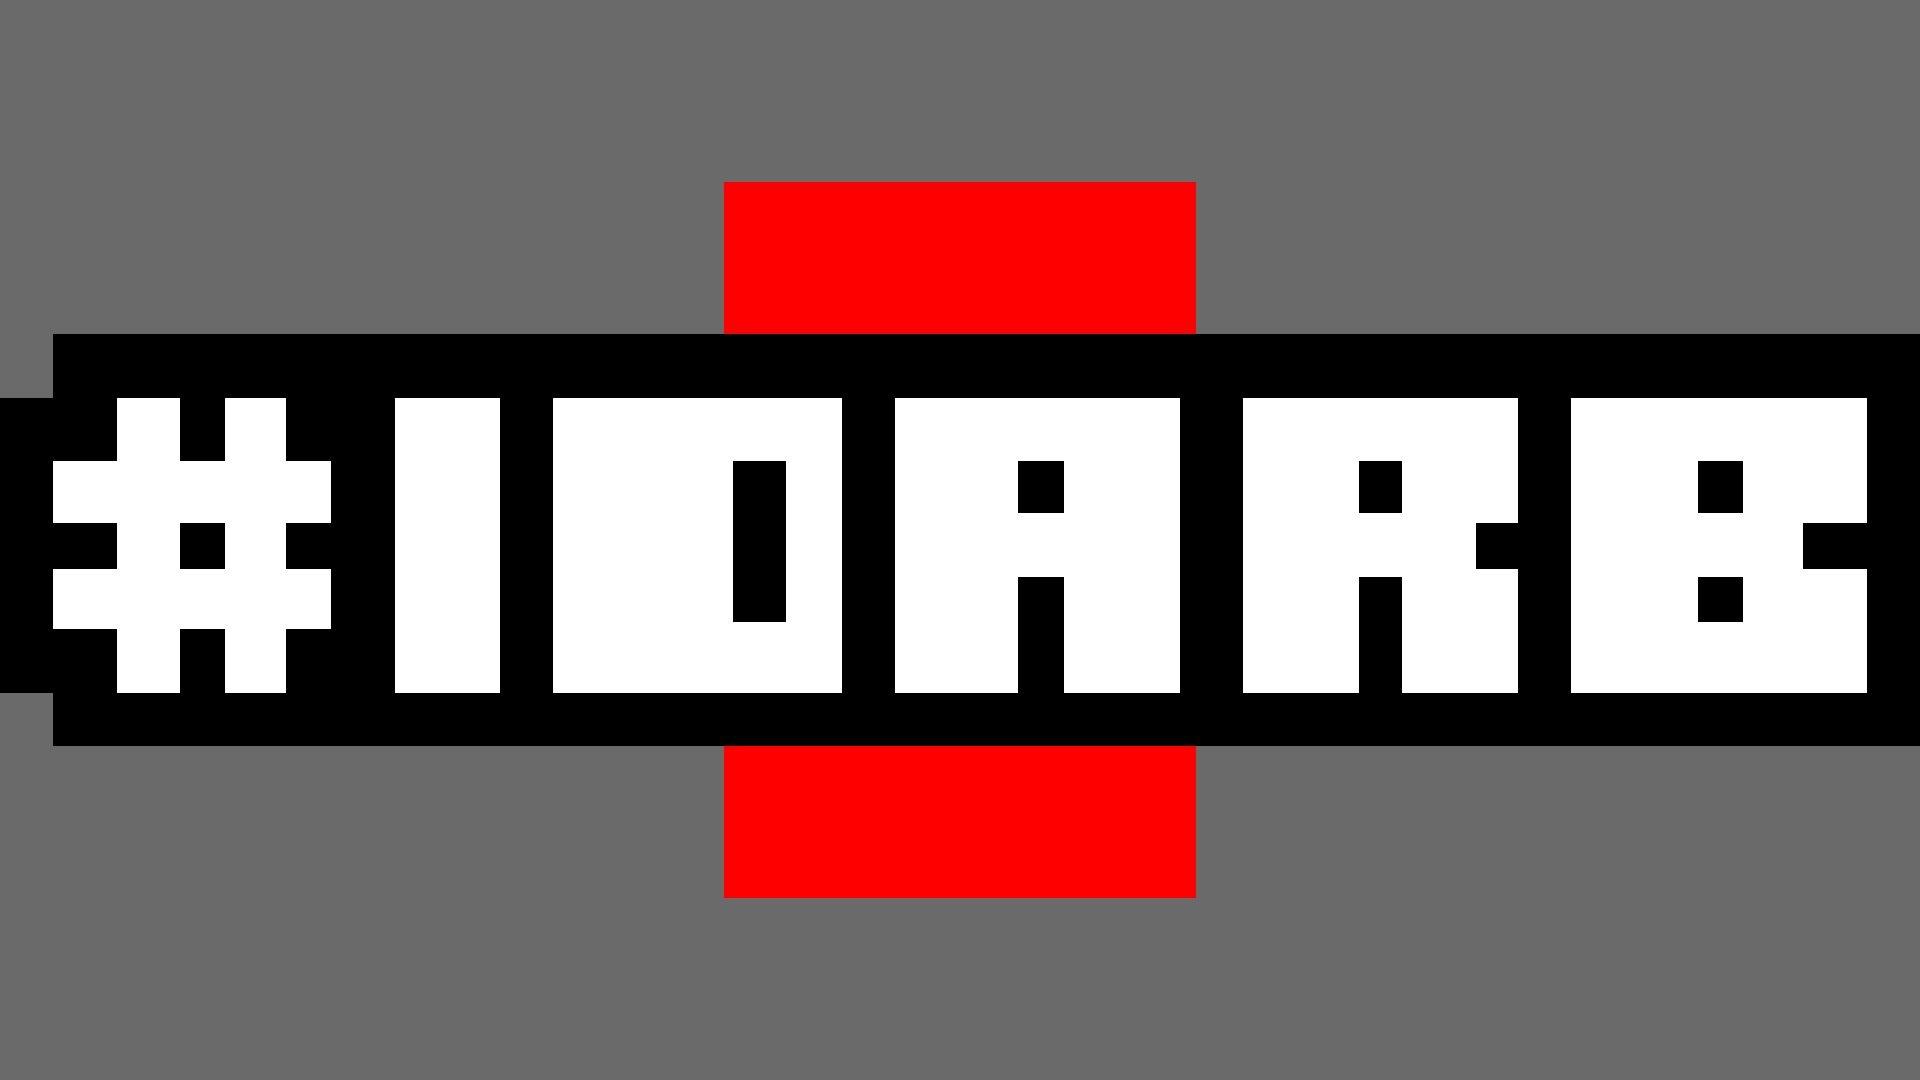 IDARB